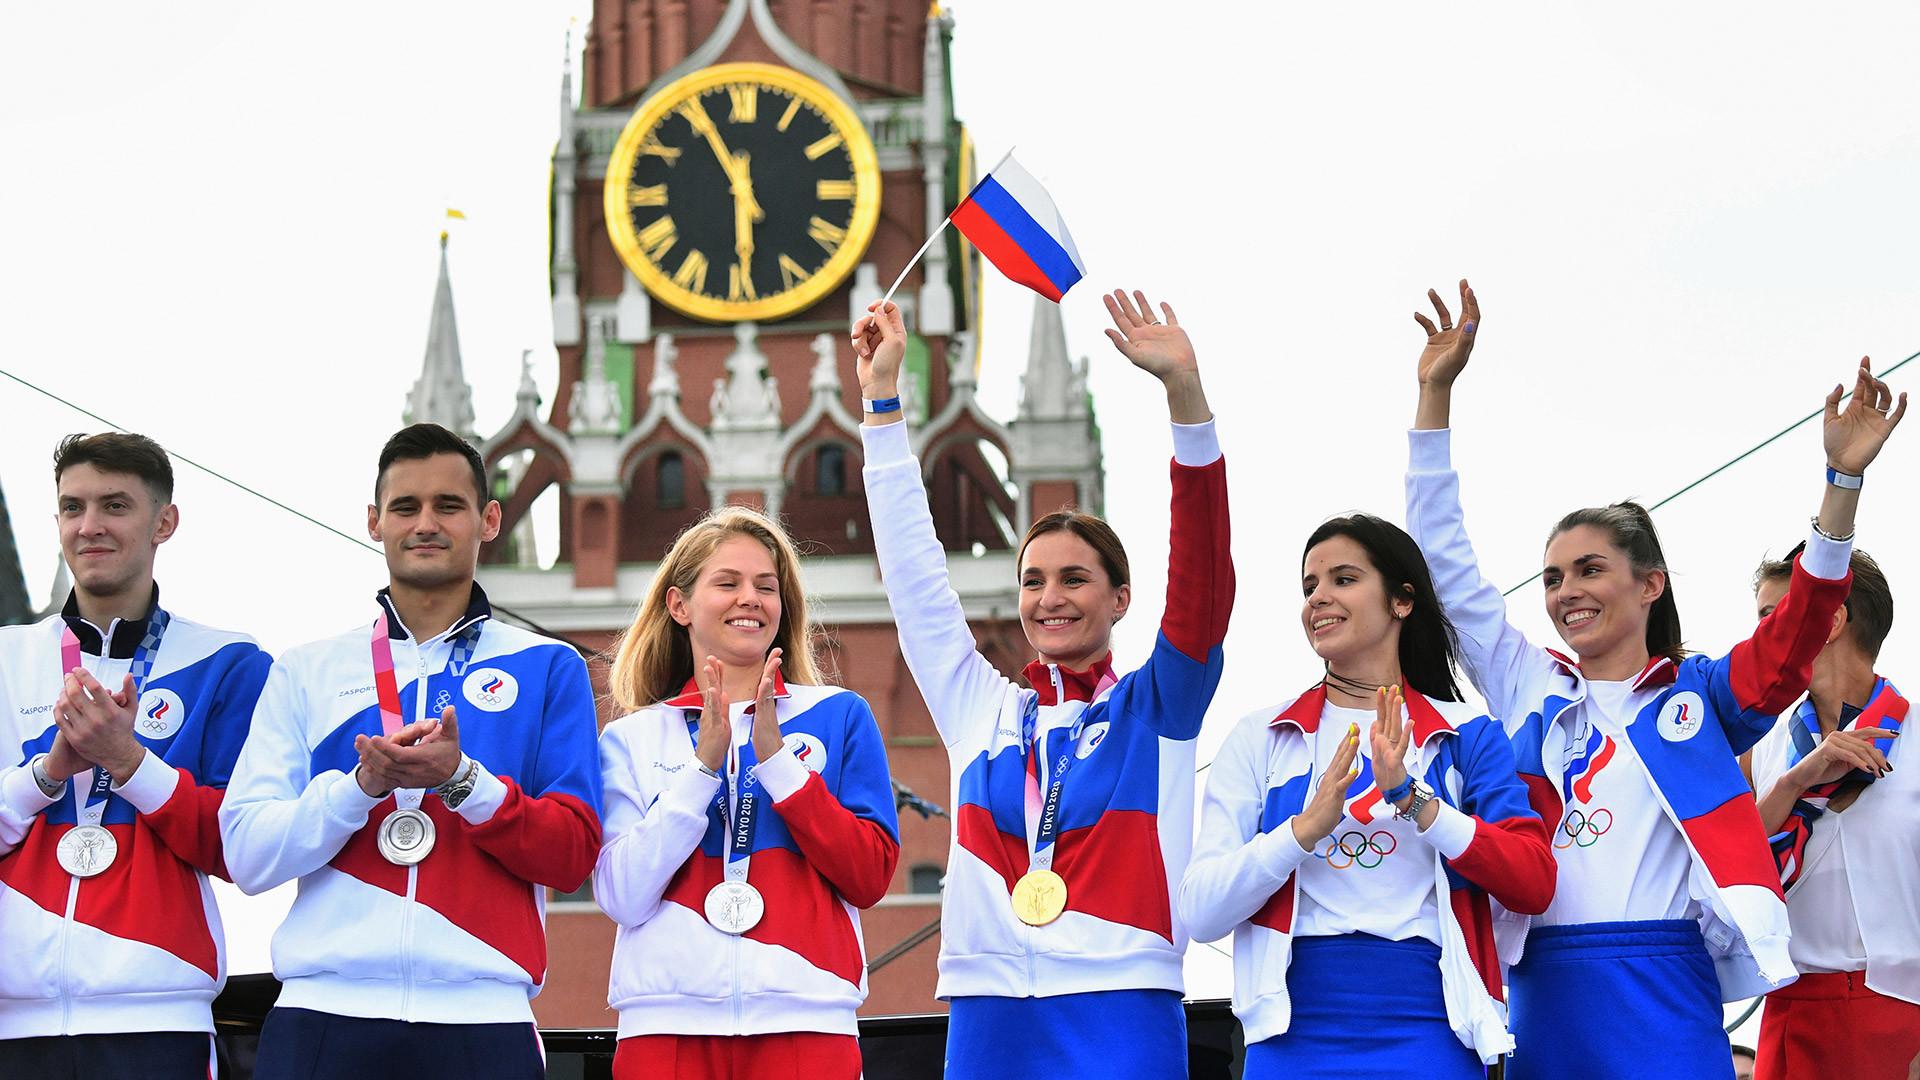 De gauche à droite: Vladislav Mylnikov (escrime), Timur Safin (escrime), Tatiana Minina (taekwondo), Sofia Velikaya (escrime), Olga Nikitina (escrime) et Sofia Pozdniakova (escrime) au concert en l'honneur des athlètes russes des JO de Tokyo donné sur la place Rouge, à Moscou